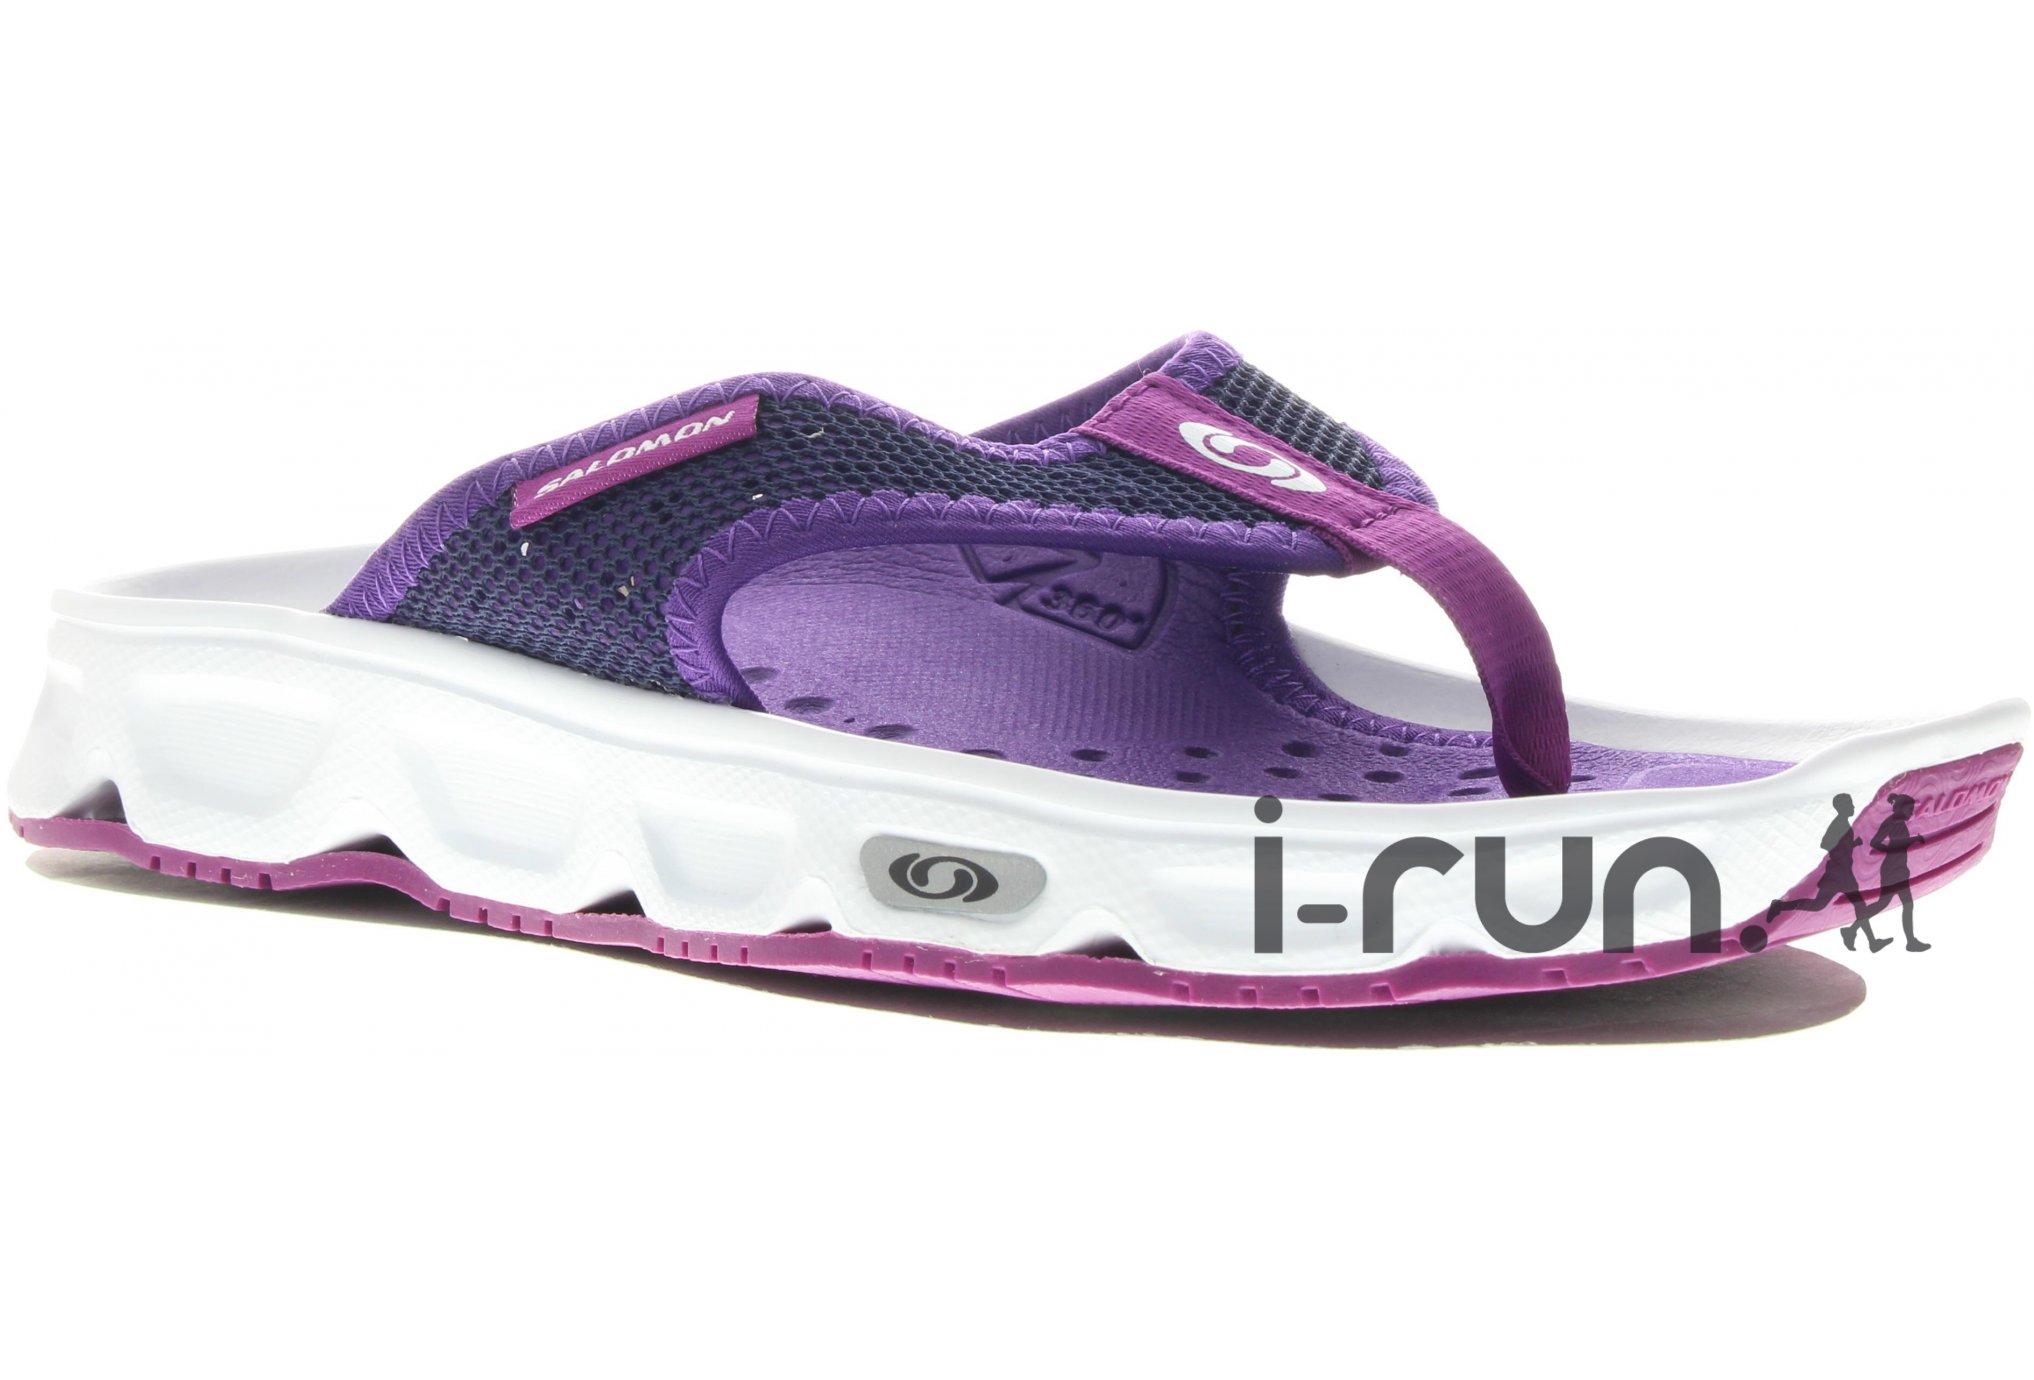 d99b43fc7c7 Rx Running Femme La Break Salomon Fortifiée Chaussures W EECqYw